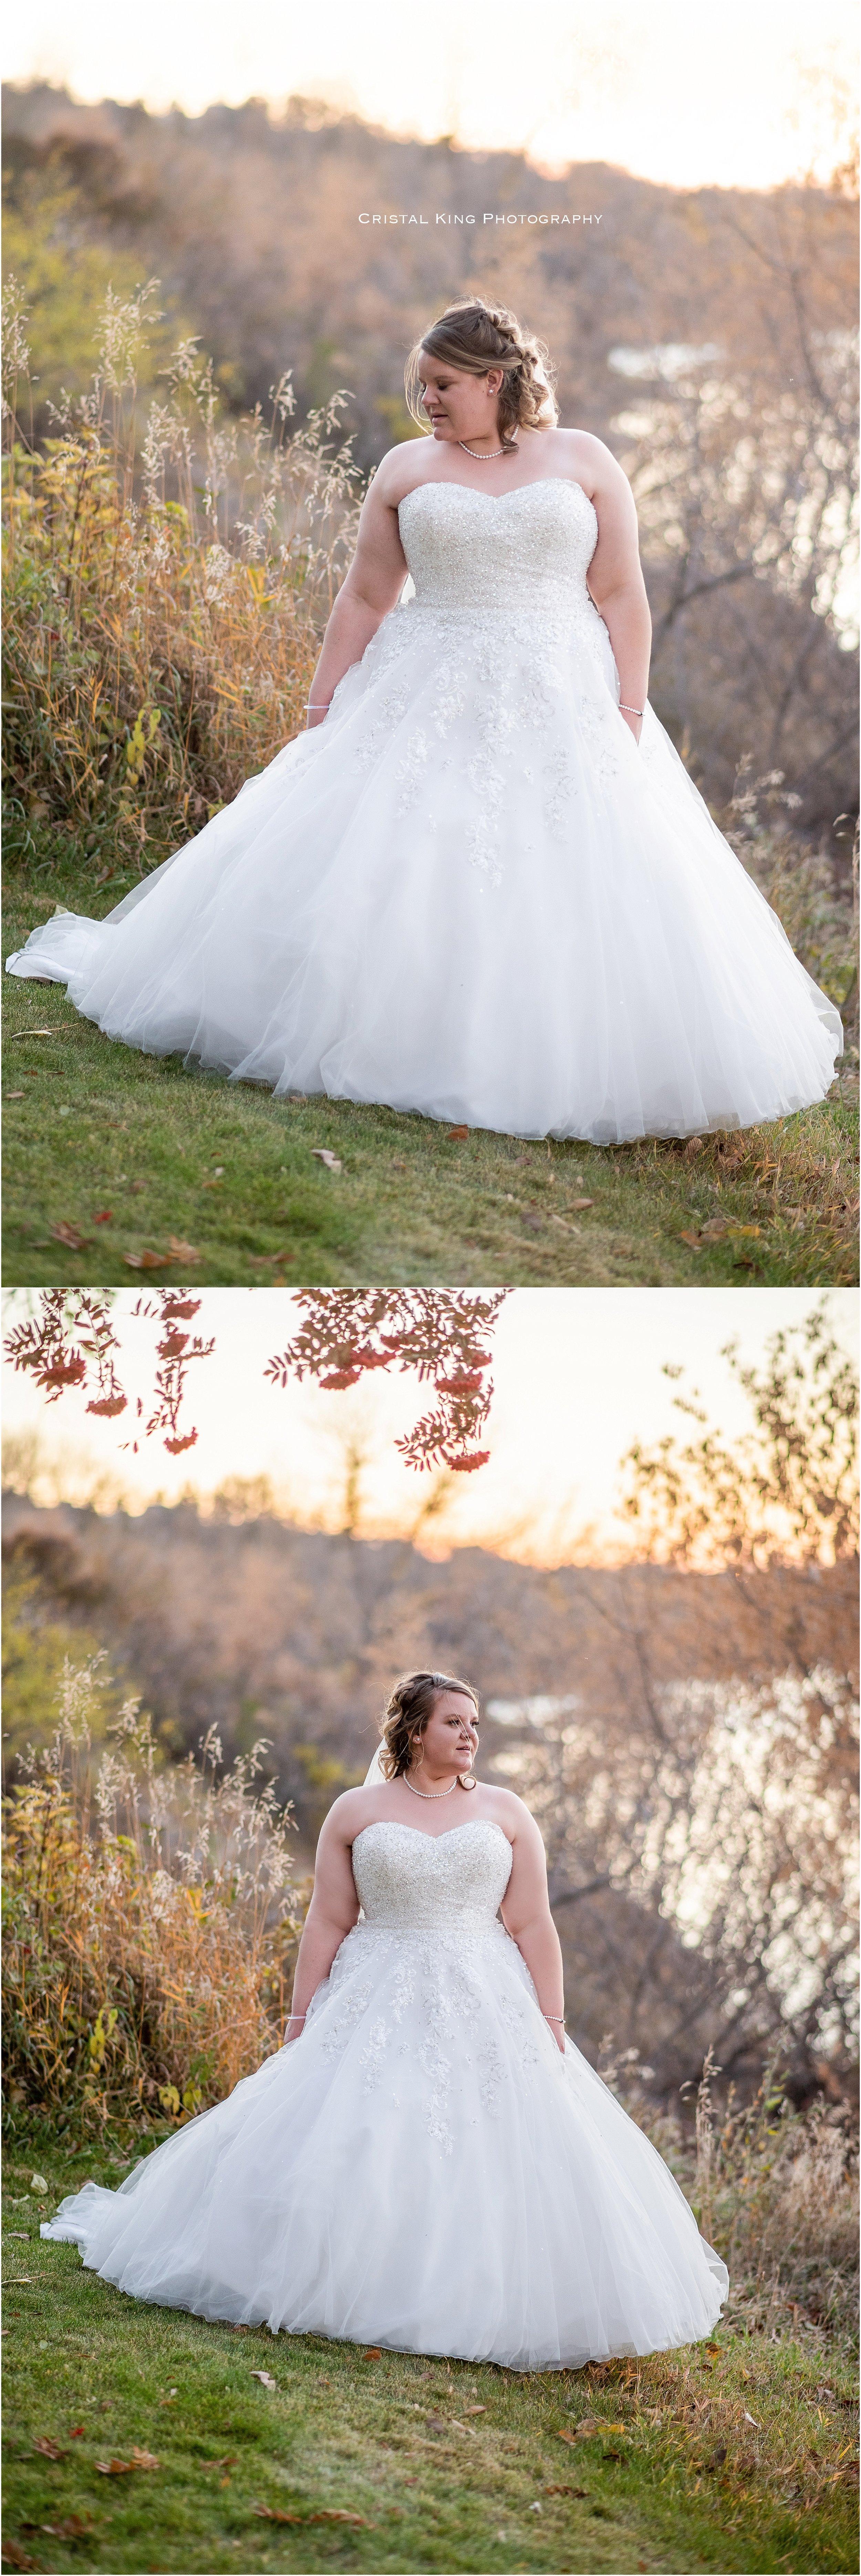 Tracy-Kyles-Wedding-192.jpg